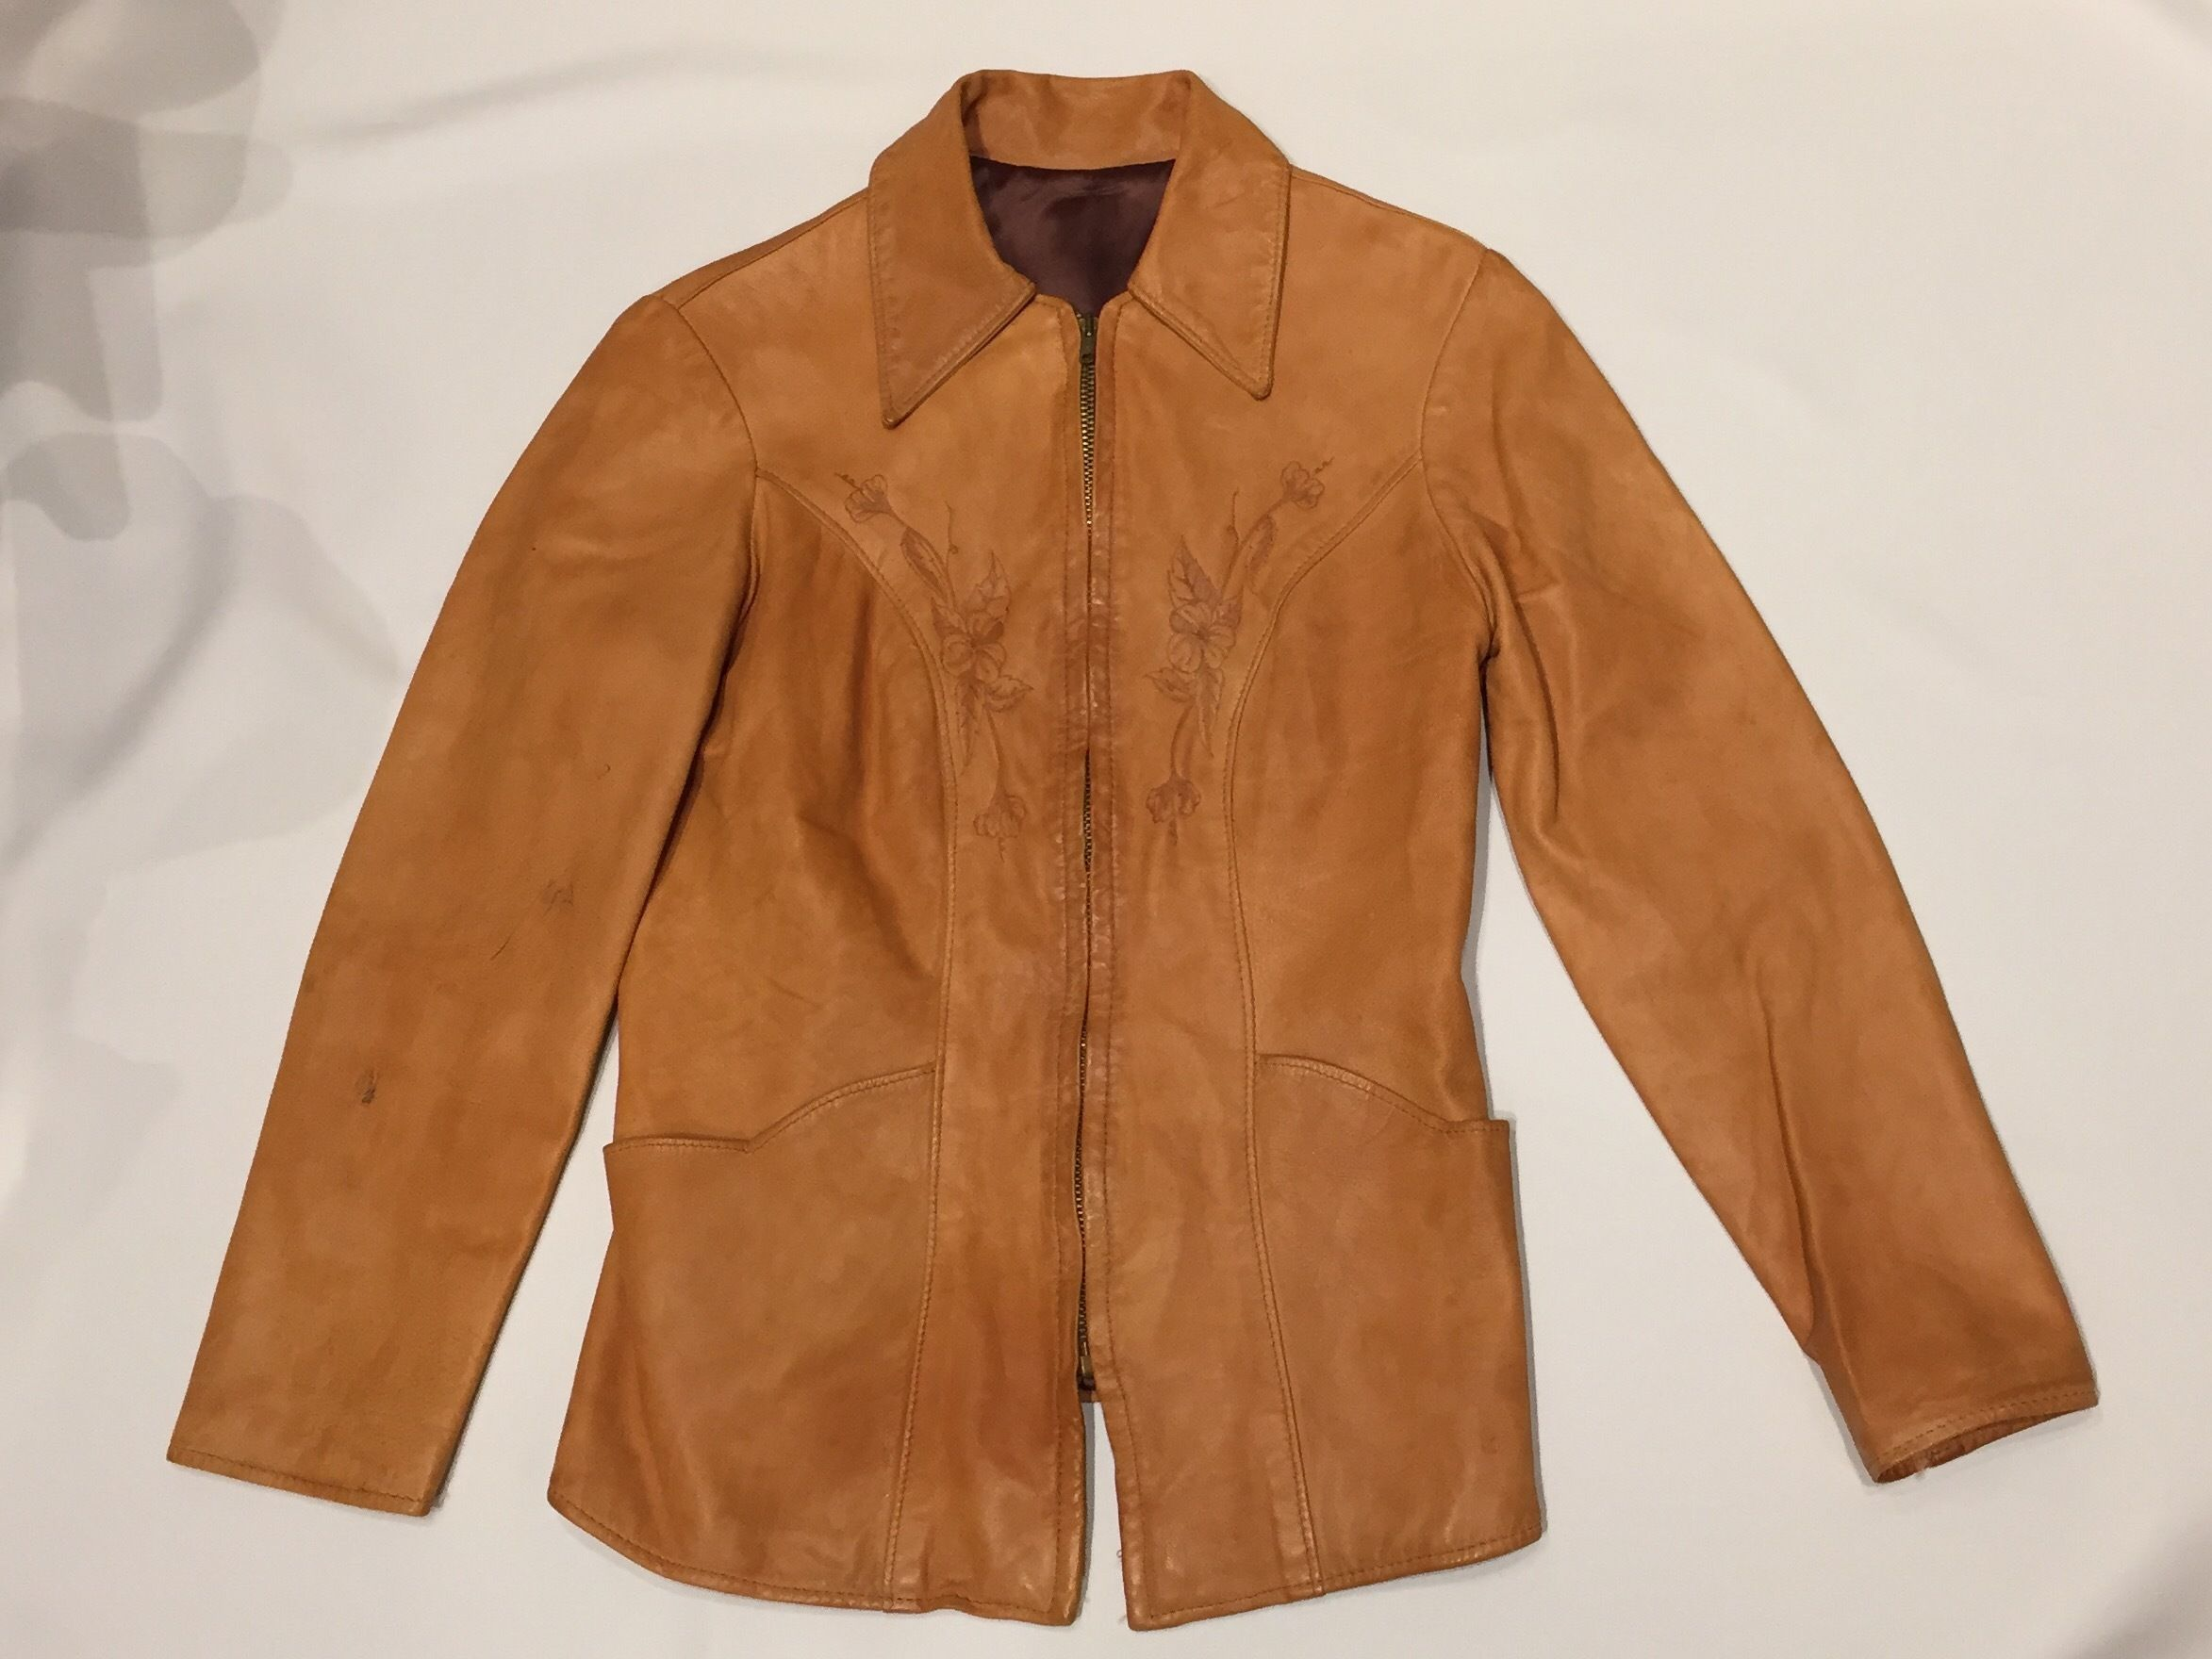 1970's Natural Comfort レザージャケット